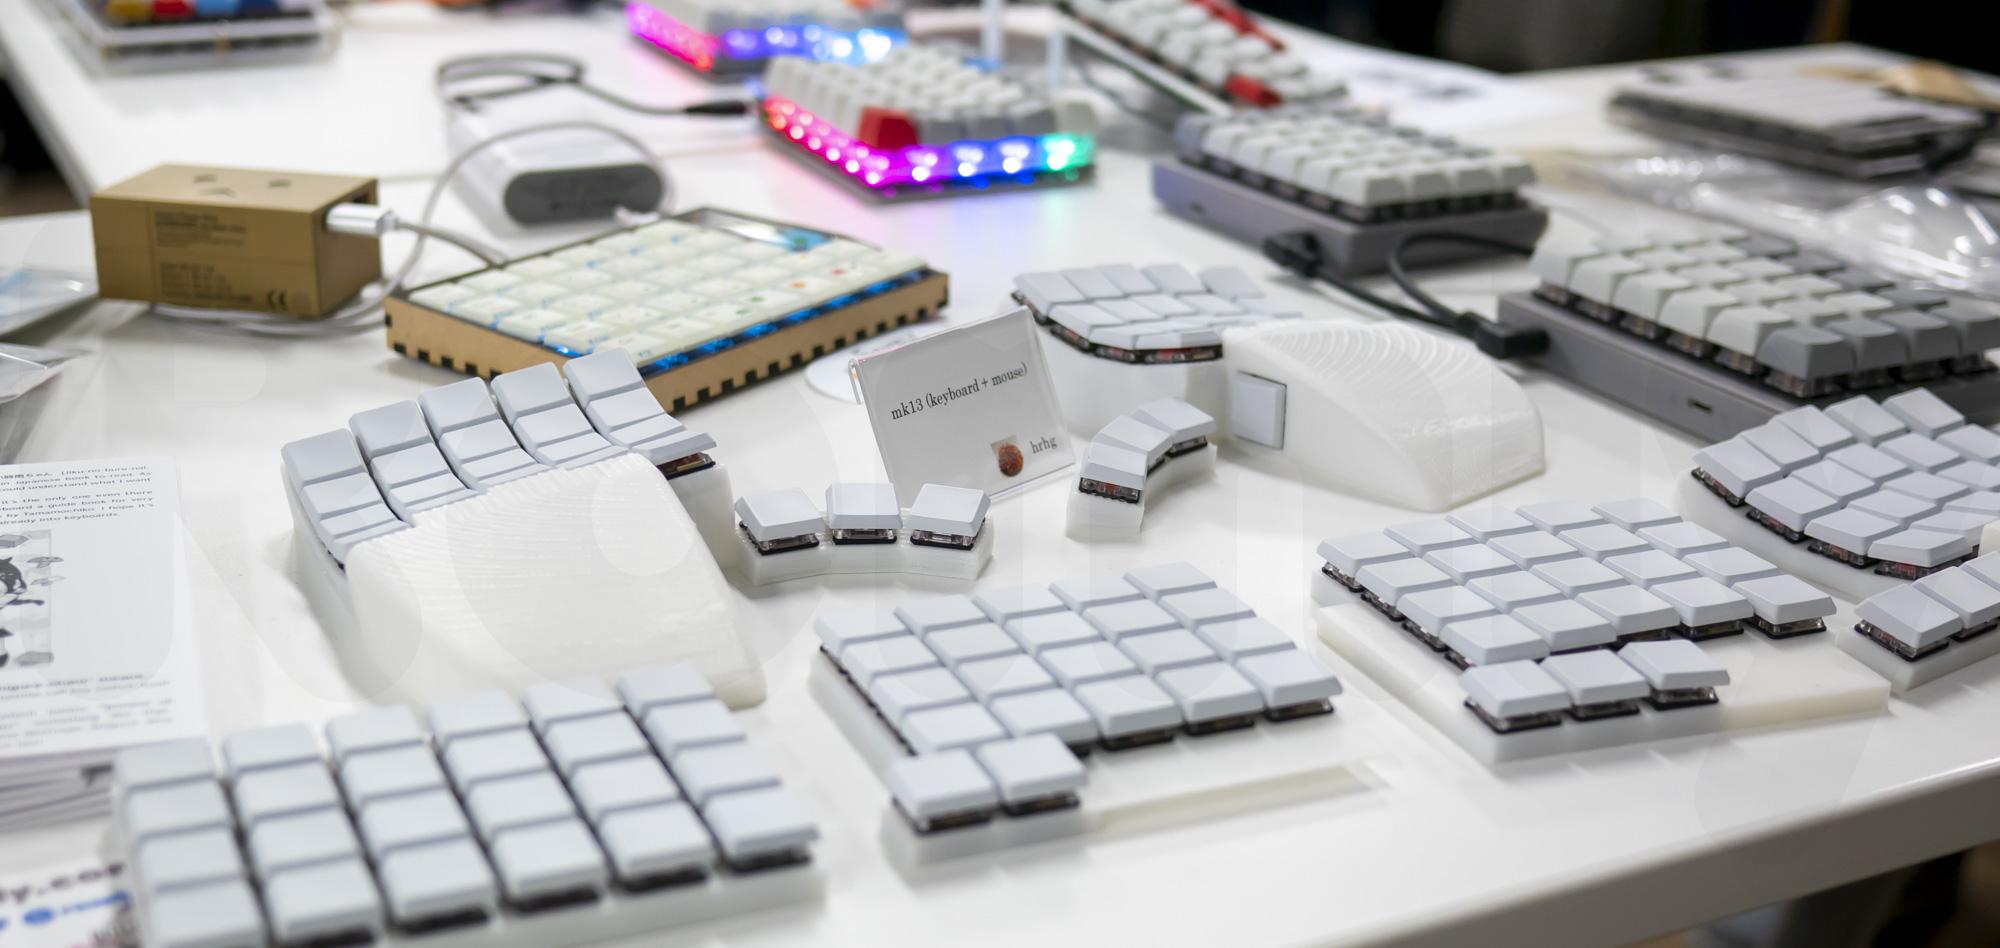 hrhg's keyboards